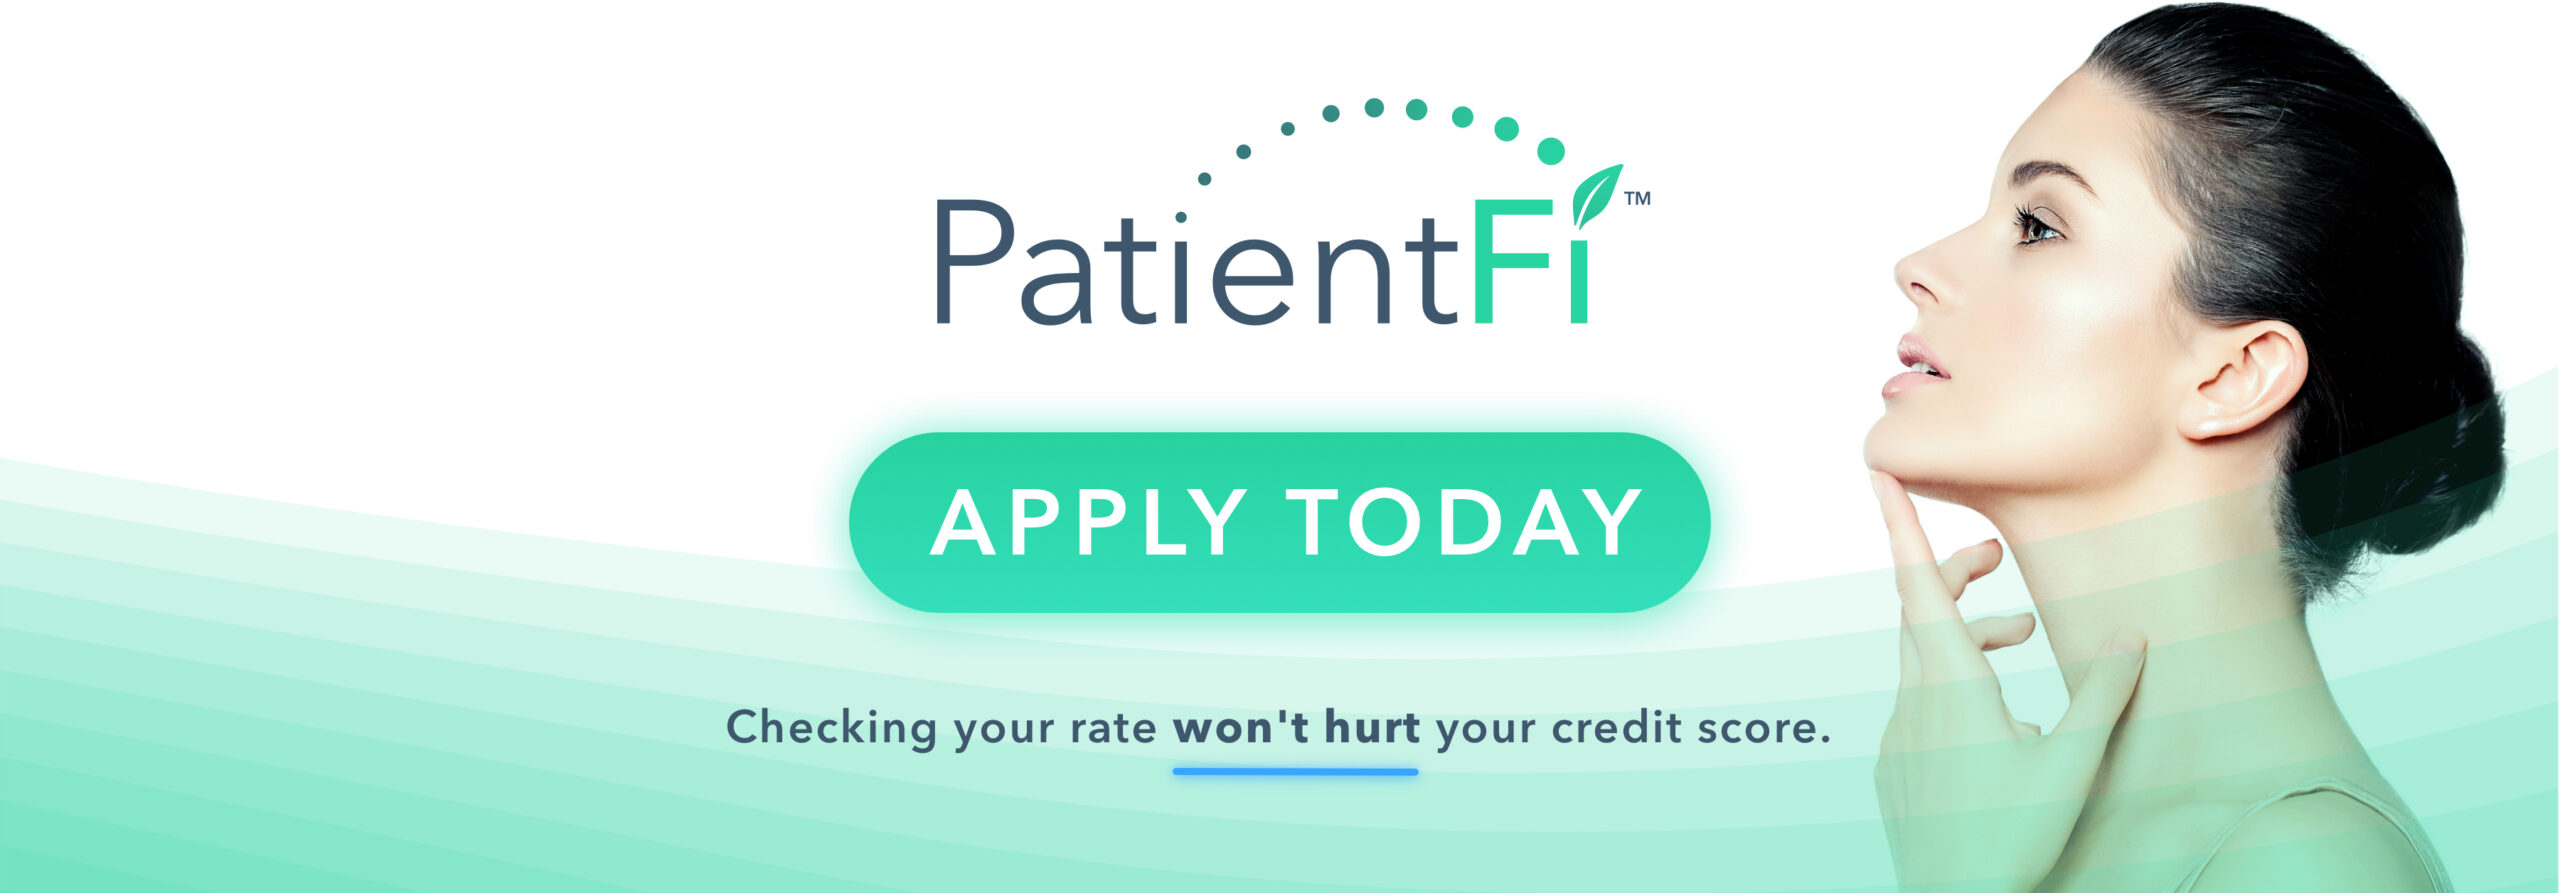 PatientFi application